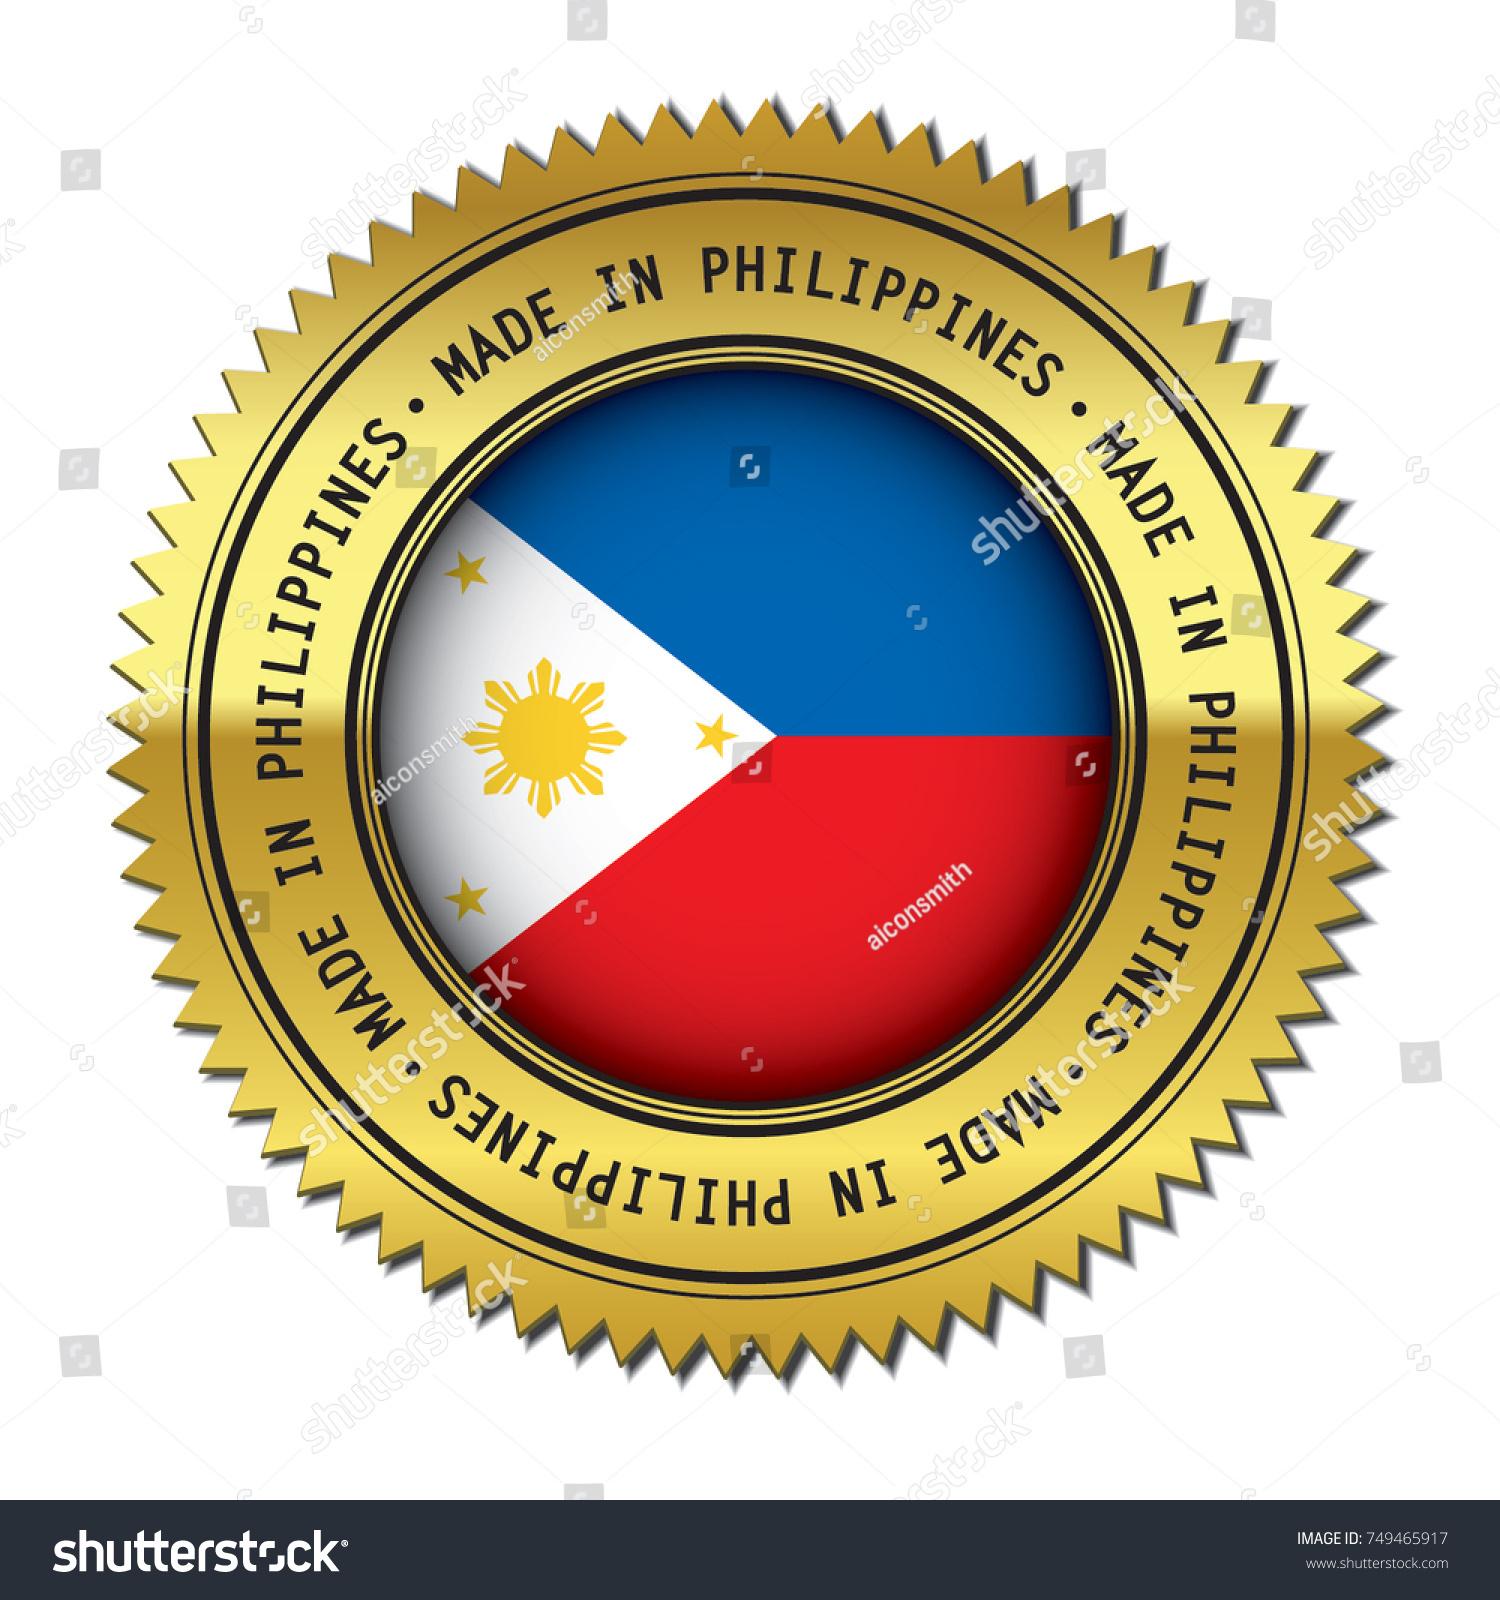 Made philippines golden badge flag symbol stock vector 749465917 made in philippines golden badge with the flag symbol of philippine flag in the center buycottarizona Images